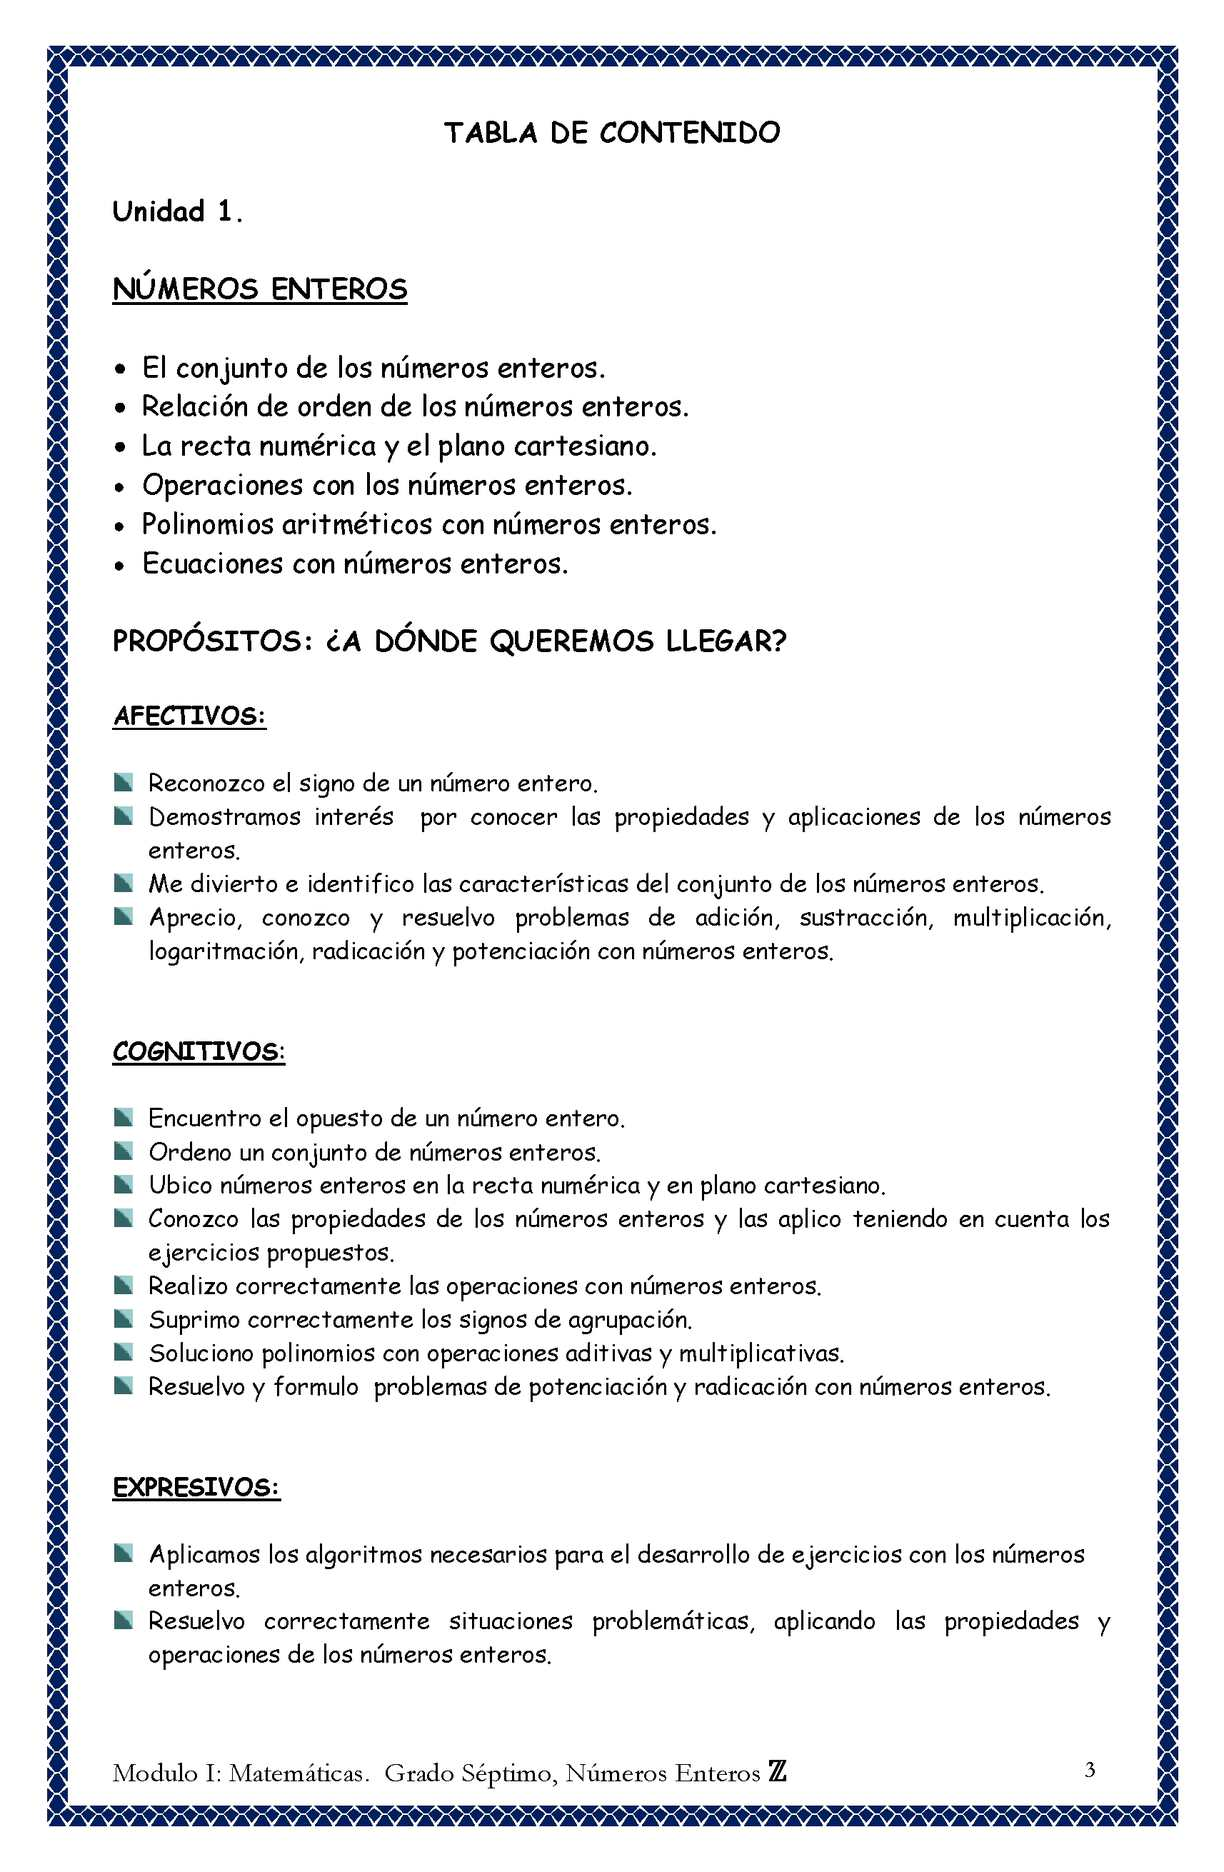 MATEMÁTICAS MODULO 1 - CALAMEO Downloader